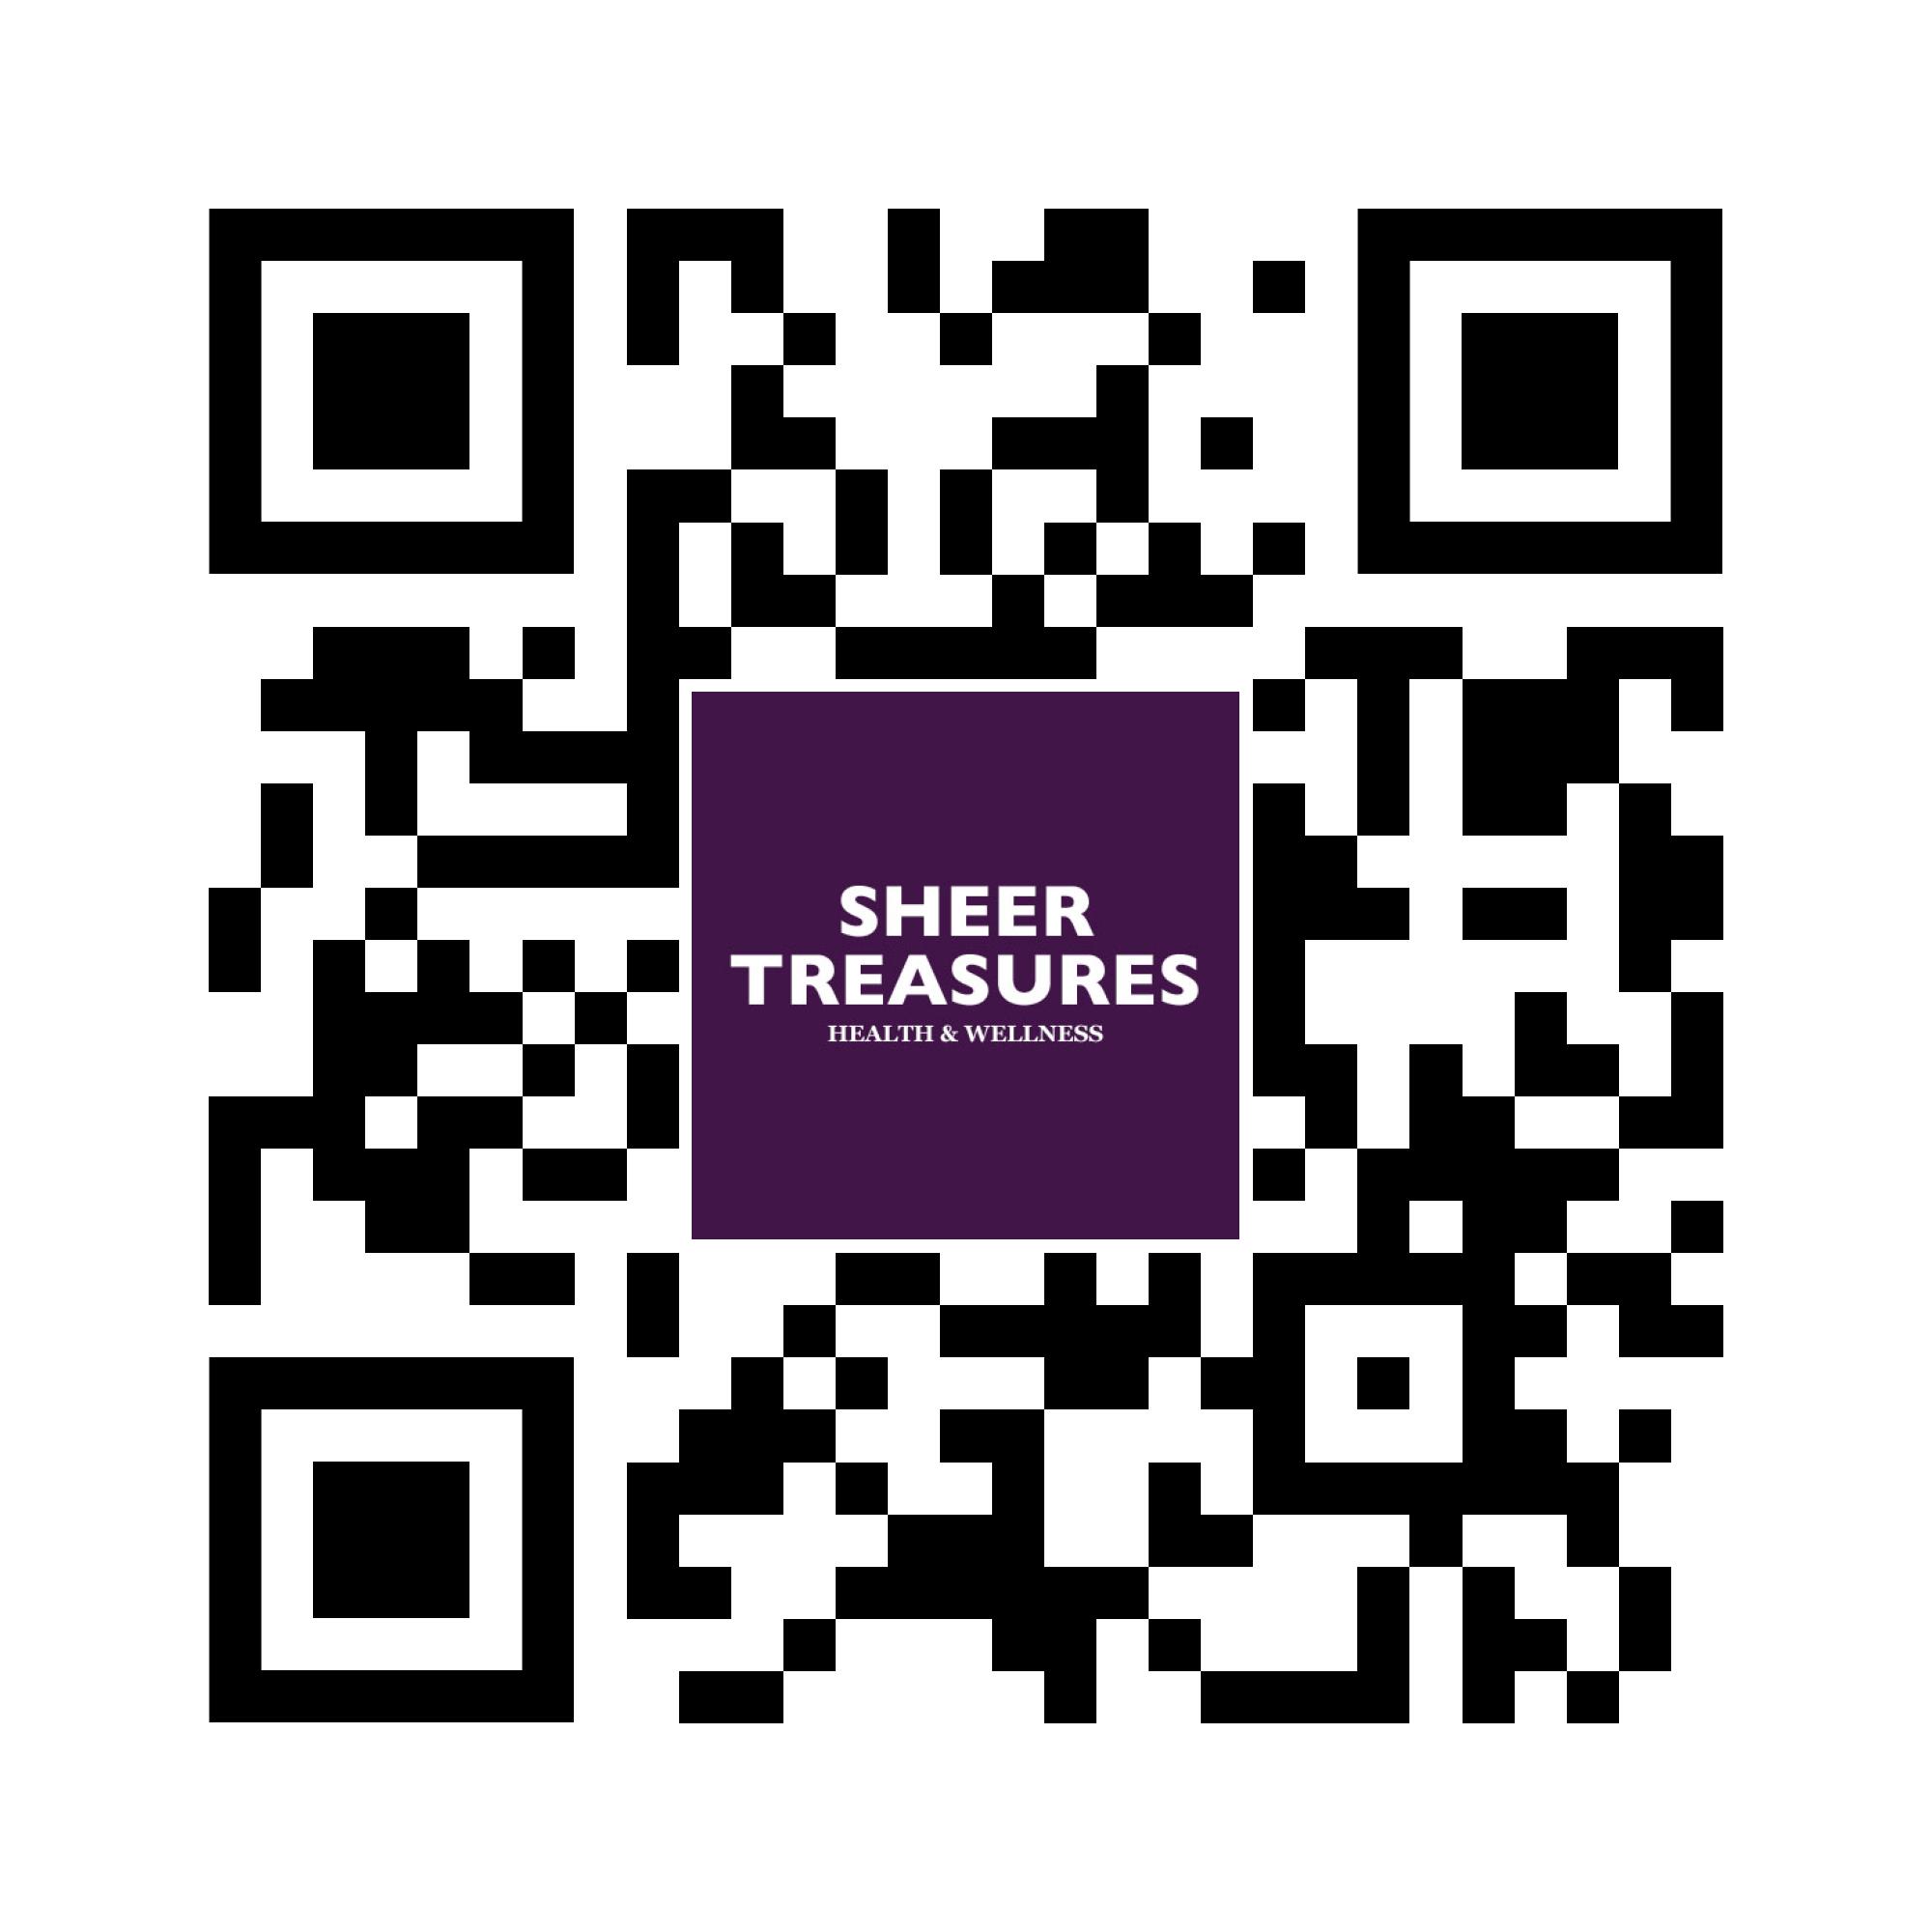 Sheer Treasures Co. - Ridgedale Center, Minnetonka, MN. 55305 image 47